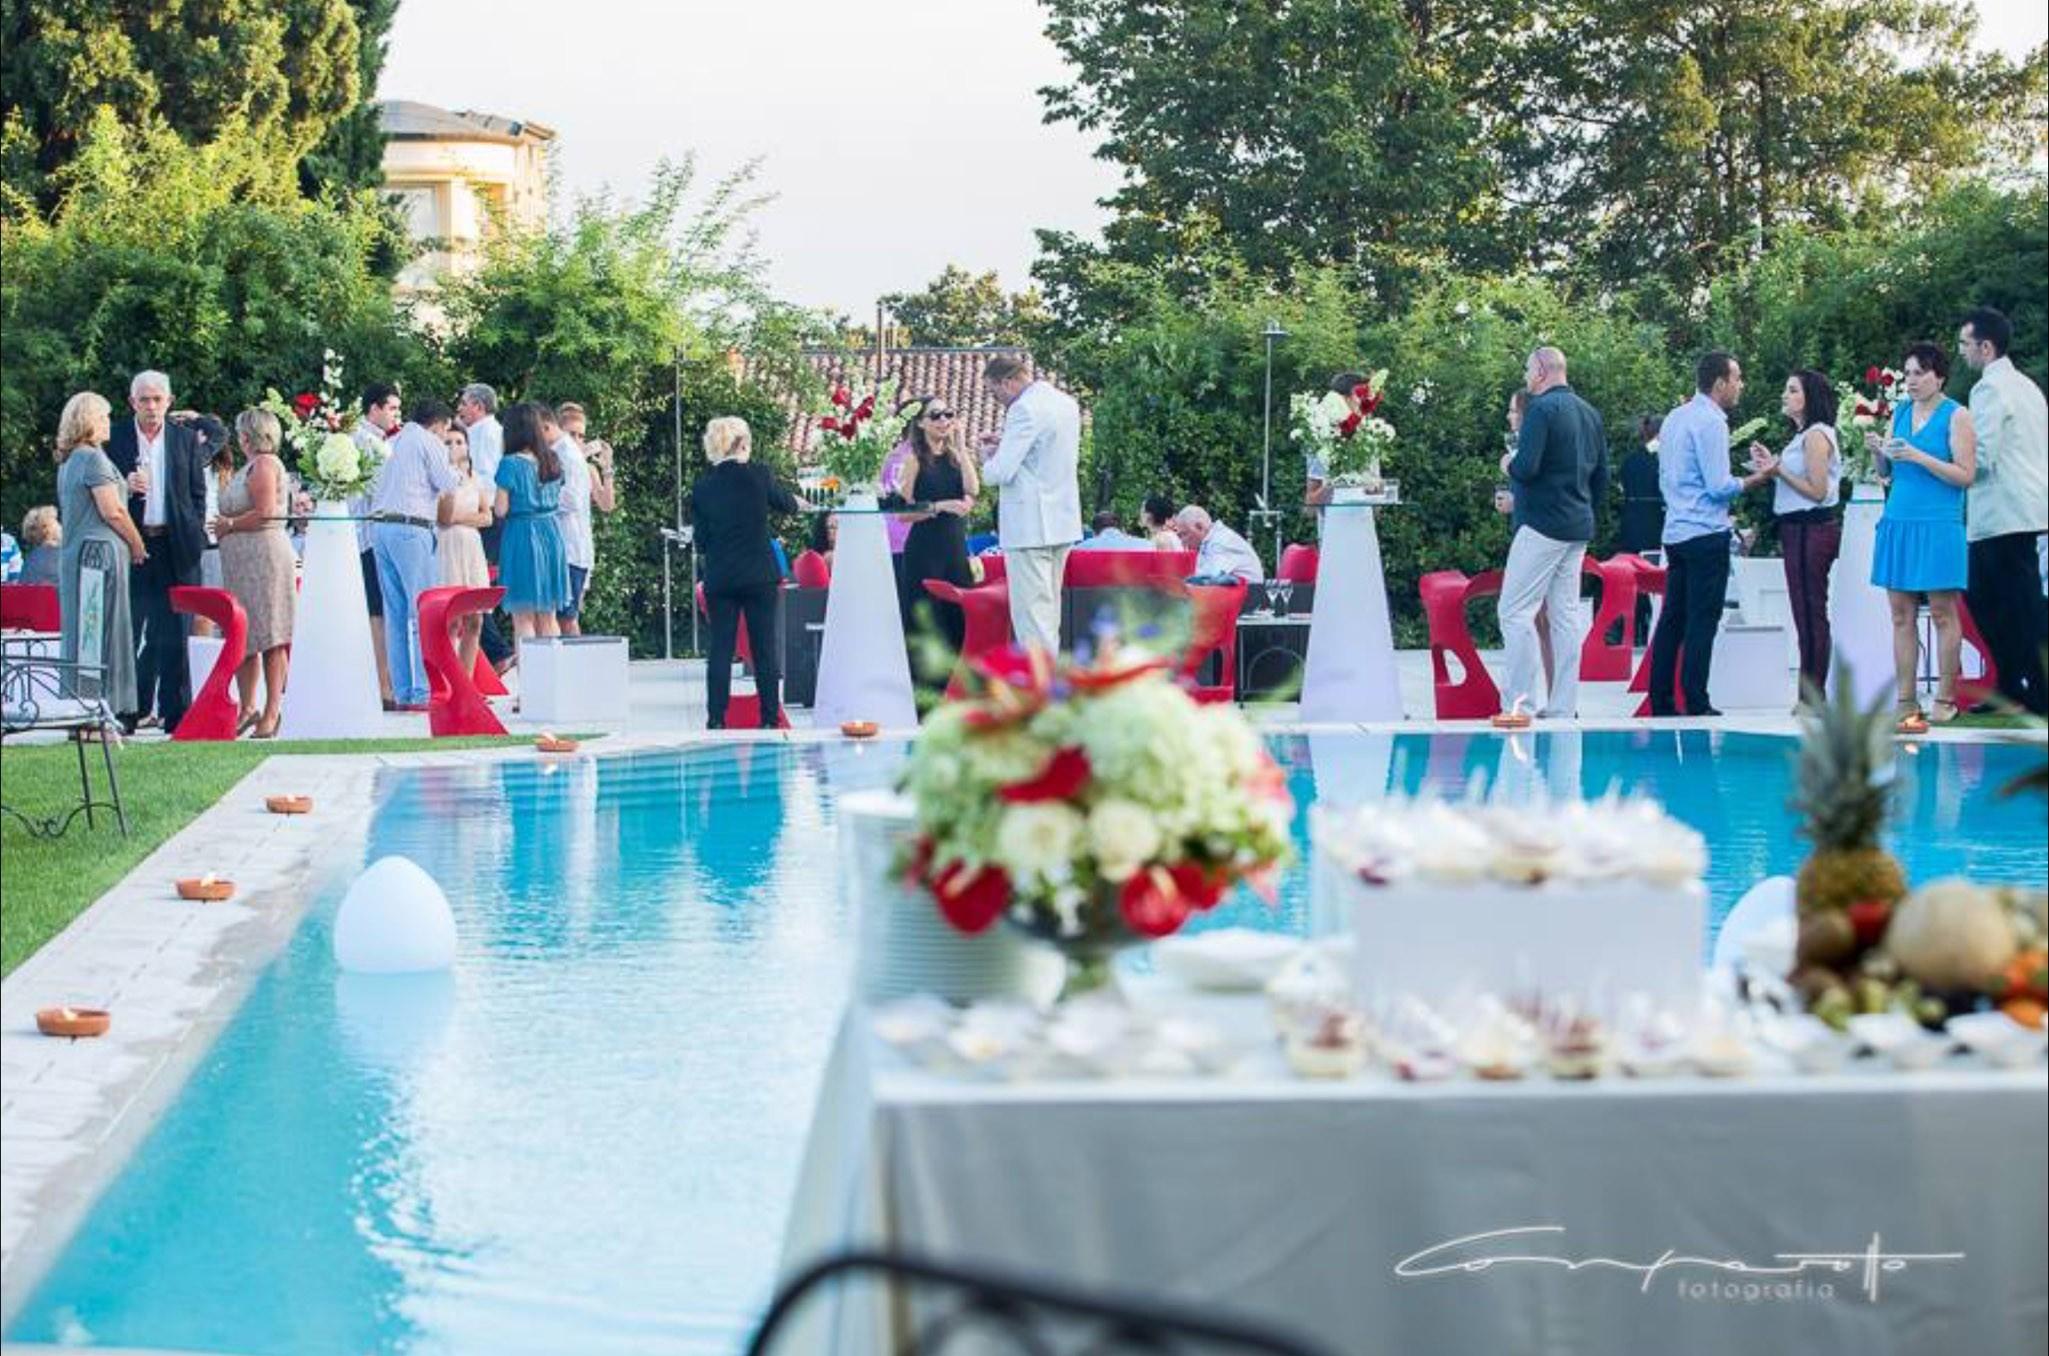 World Luxury Hotel Awards - Byblos Art Hotel has won the 2015 edition - الأخبار والأحداث